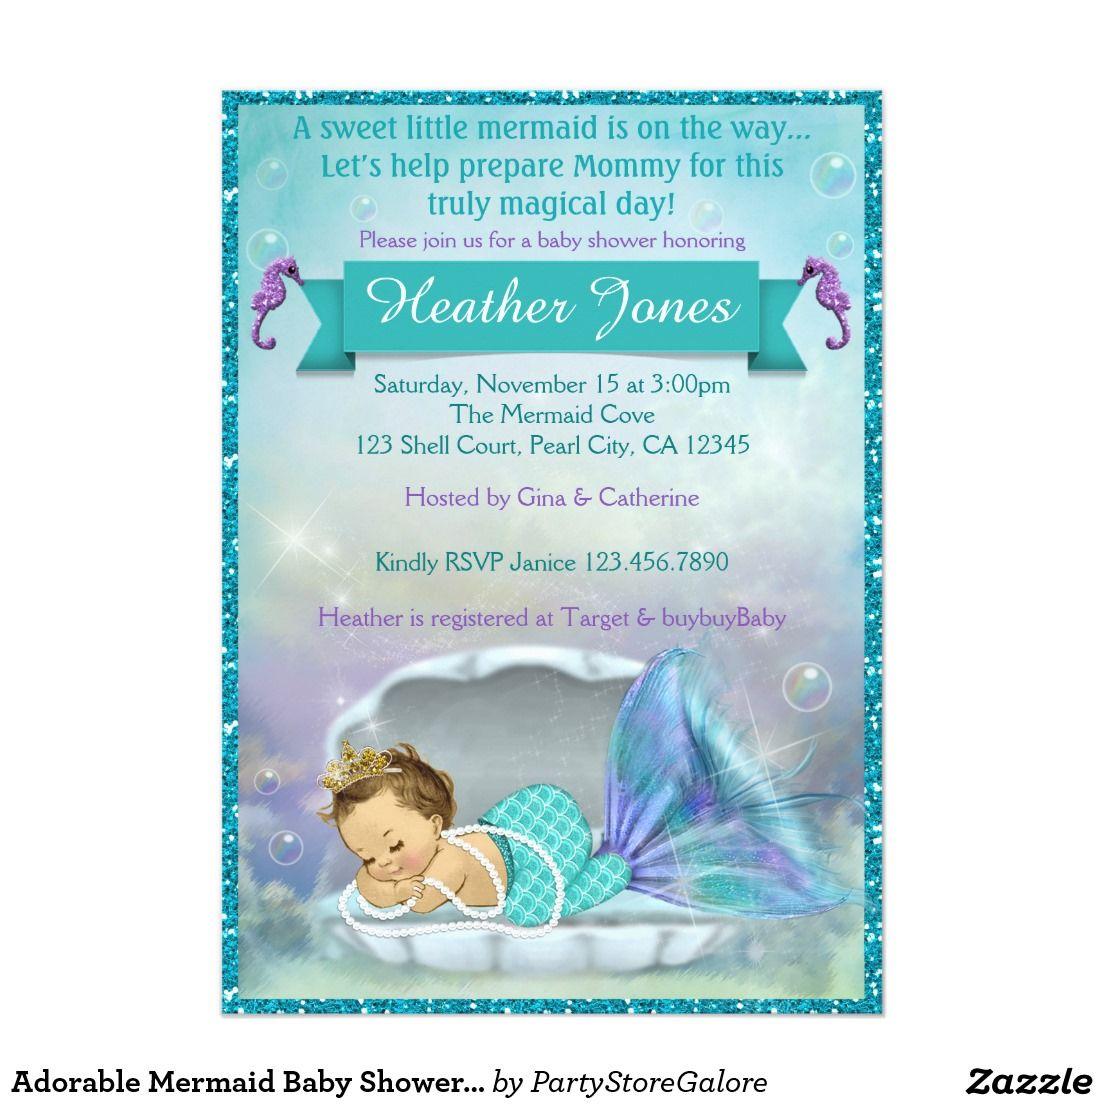 Adorable Mermaid Baby Shower Invitations #130 | Mermaid Baby Shower ...